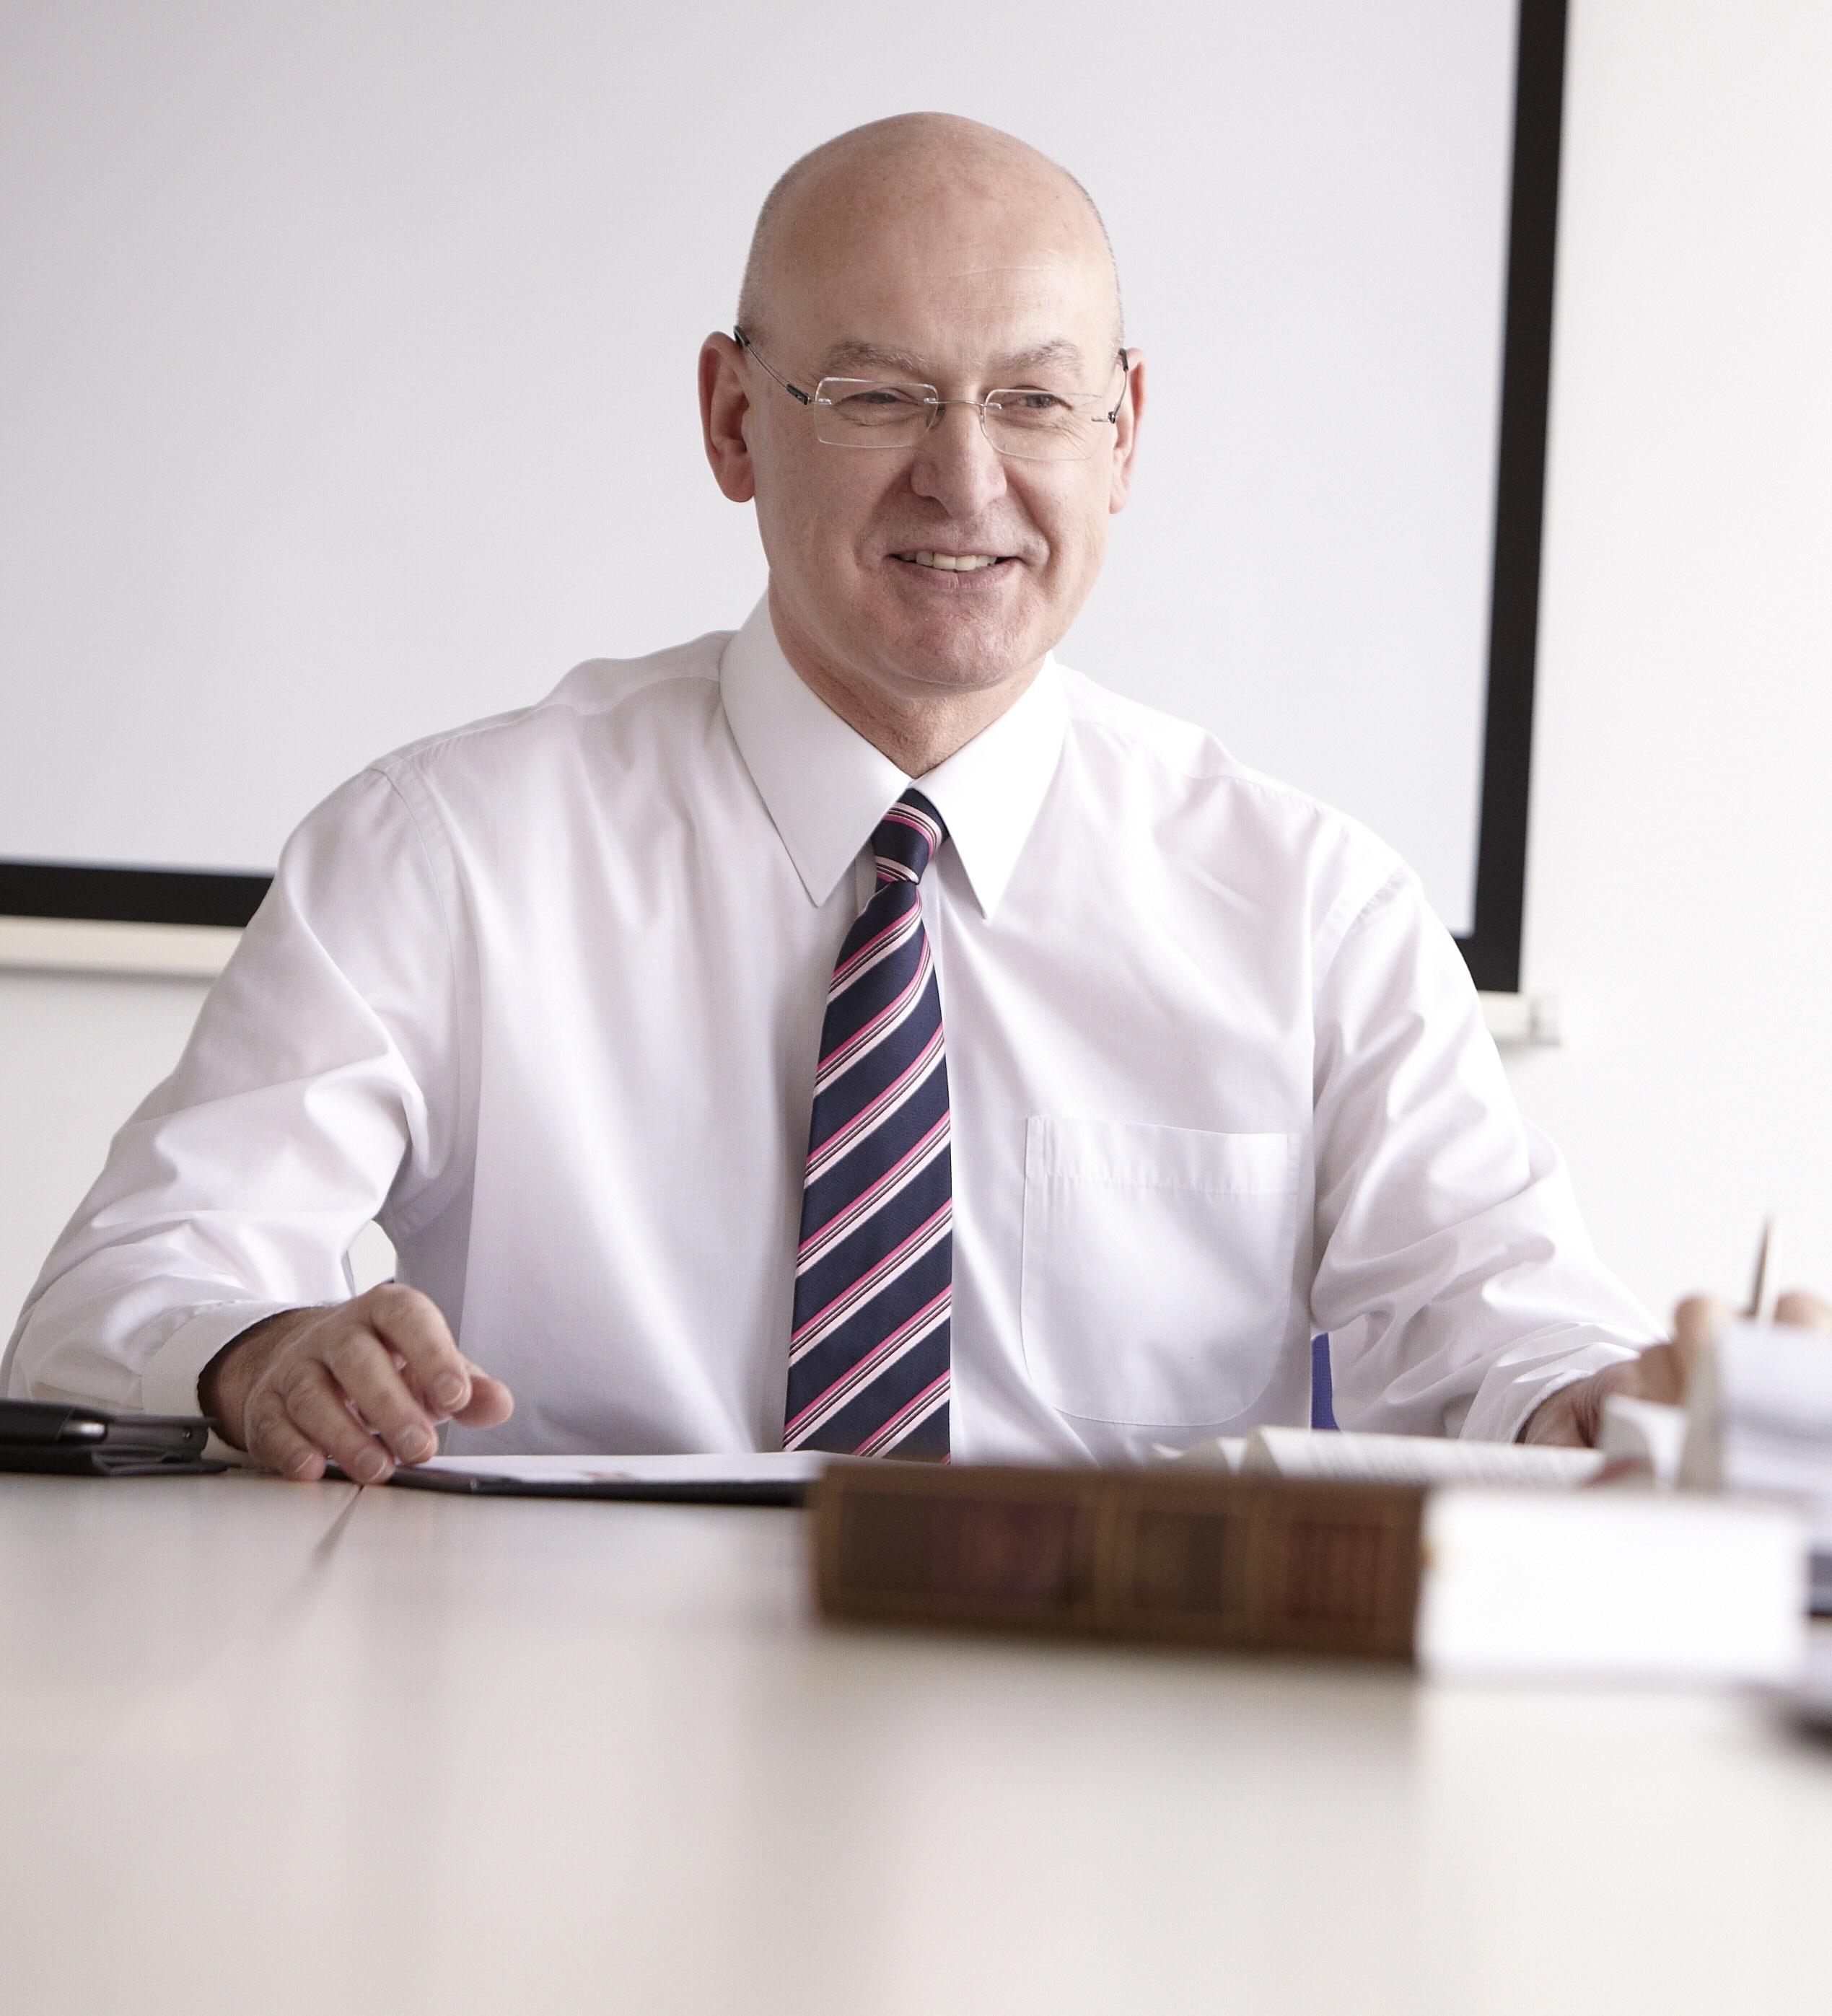 Colin Flanagan, chairman of Freeth Cartwright